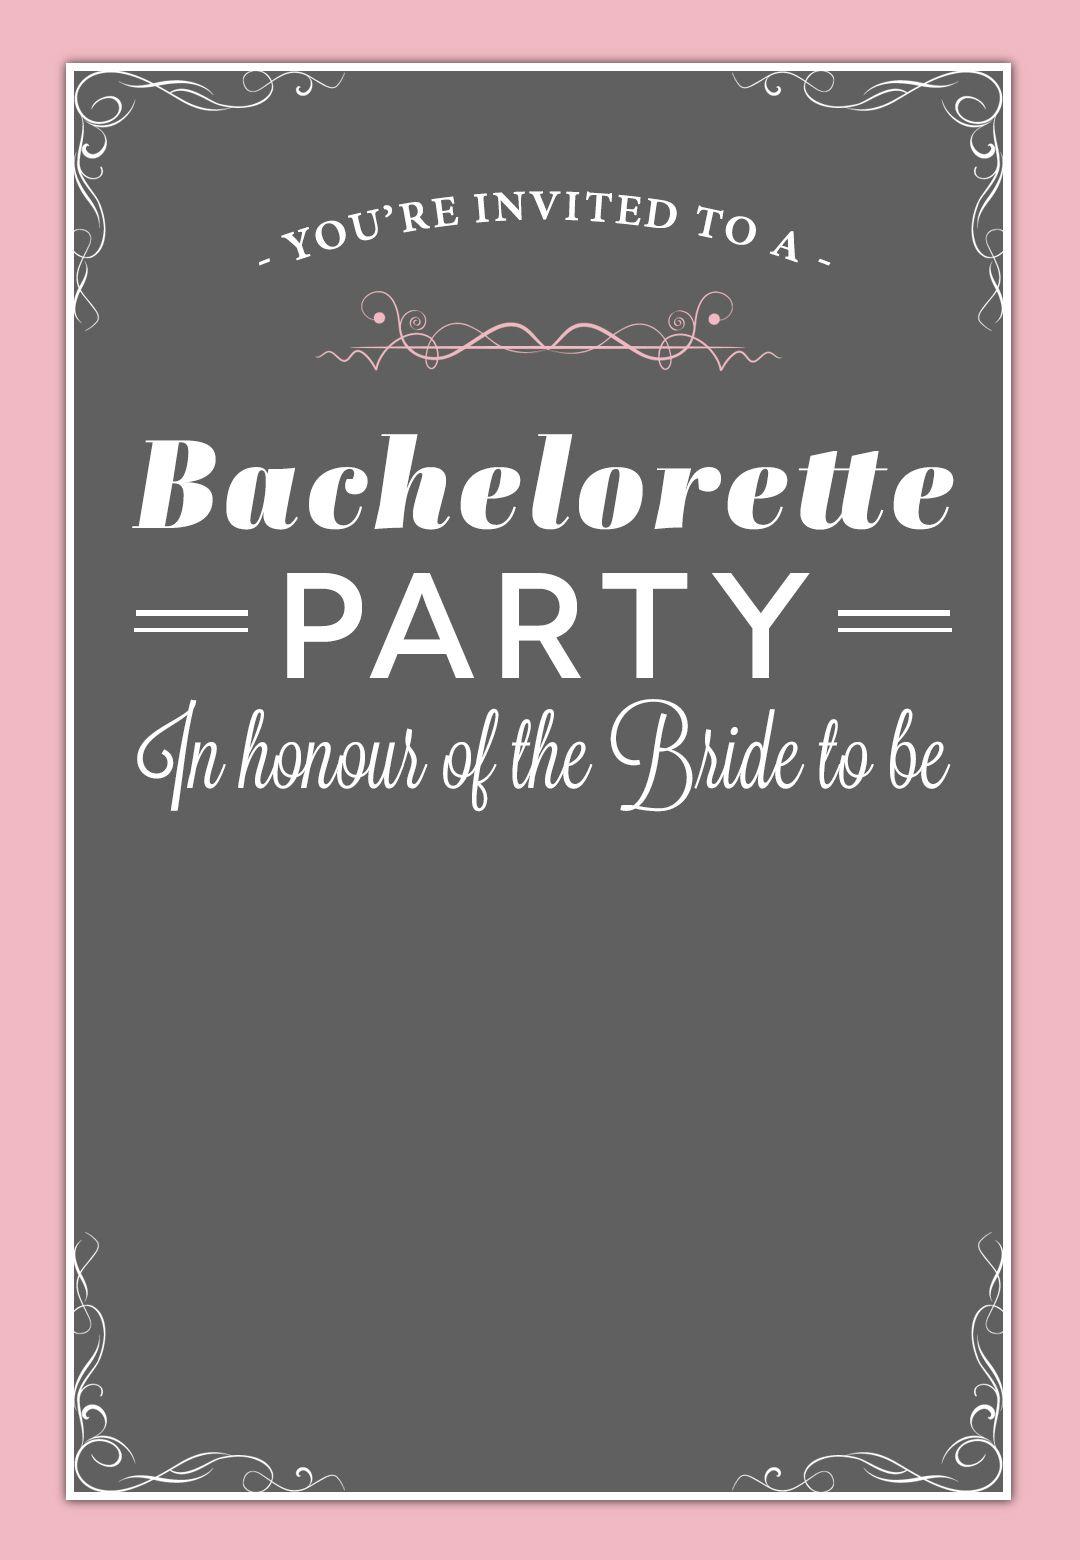 In Honour Of The Bride - Free Printable Bridal Shower Invitation - Free Printable Bridal Shower Invitations